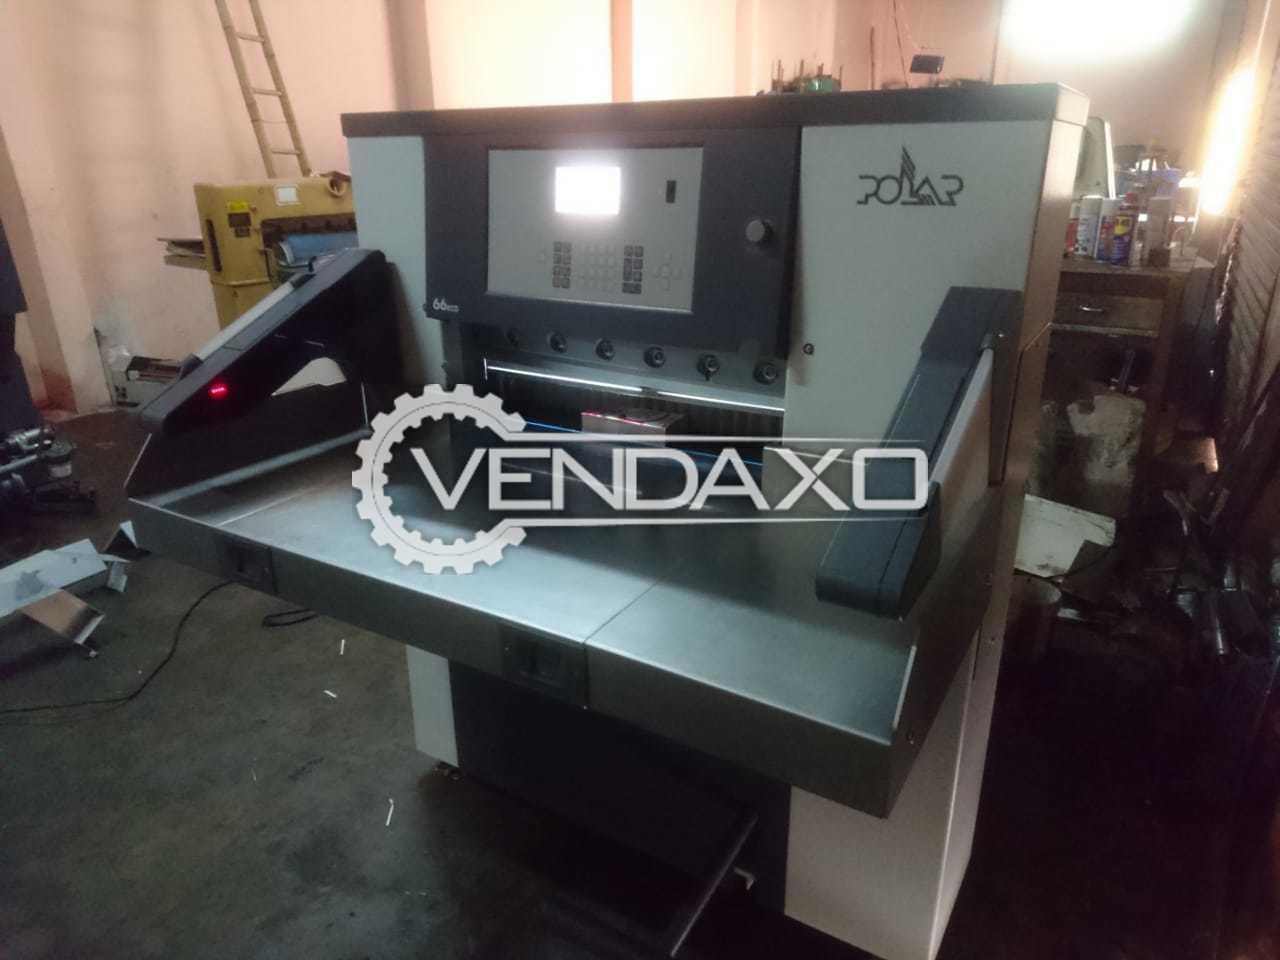 Polar 66 Eco Paper Cutting Machine - 26 Inch, 2012 Model